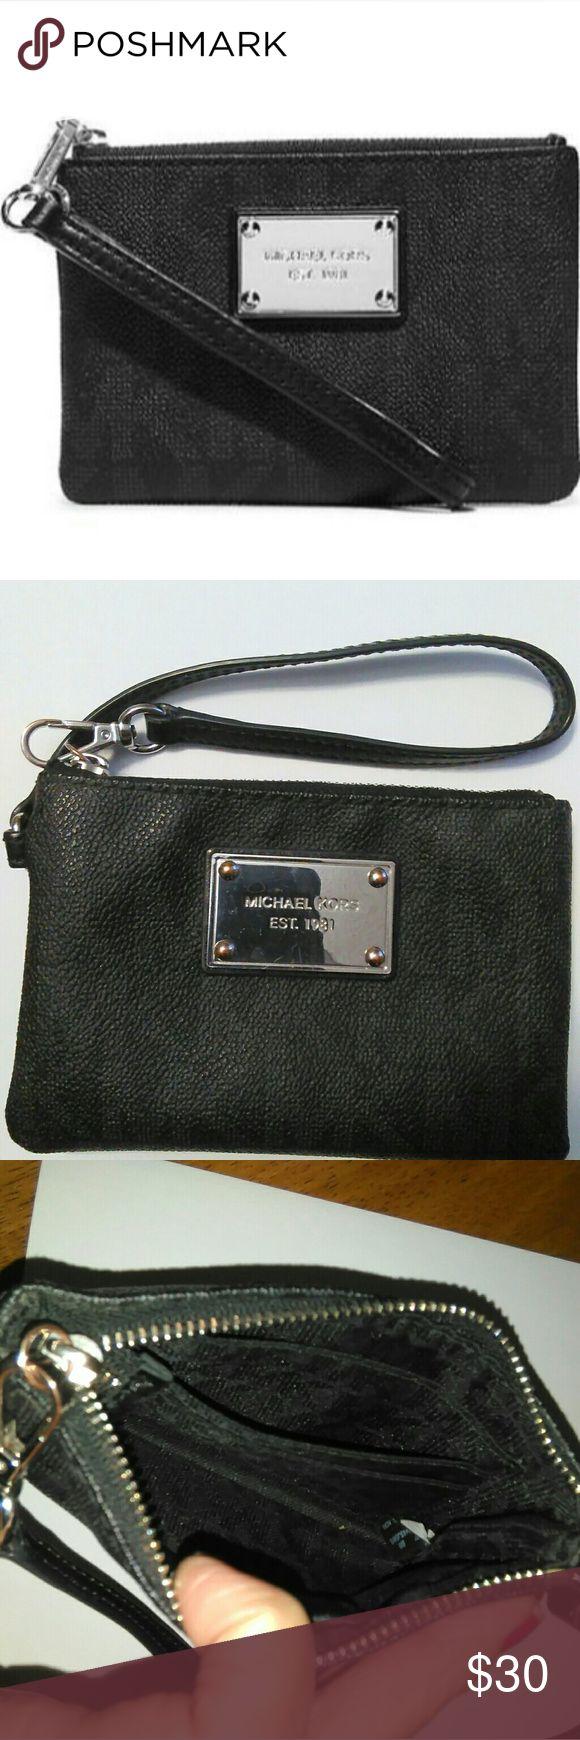 Michael Kors Jet Set Wristlet Black, good used condition. Michael Kors Bags Wallets